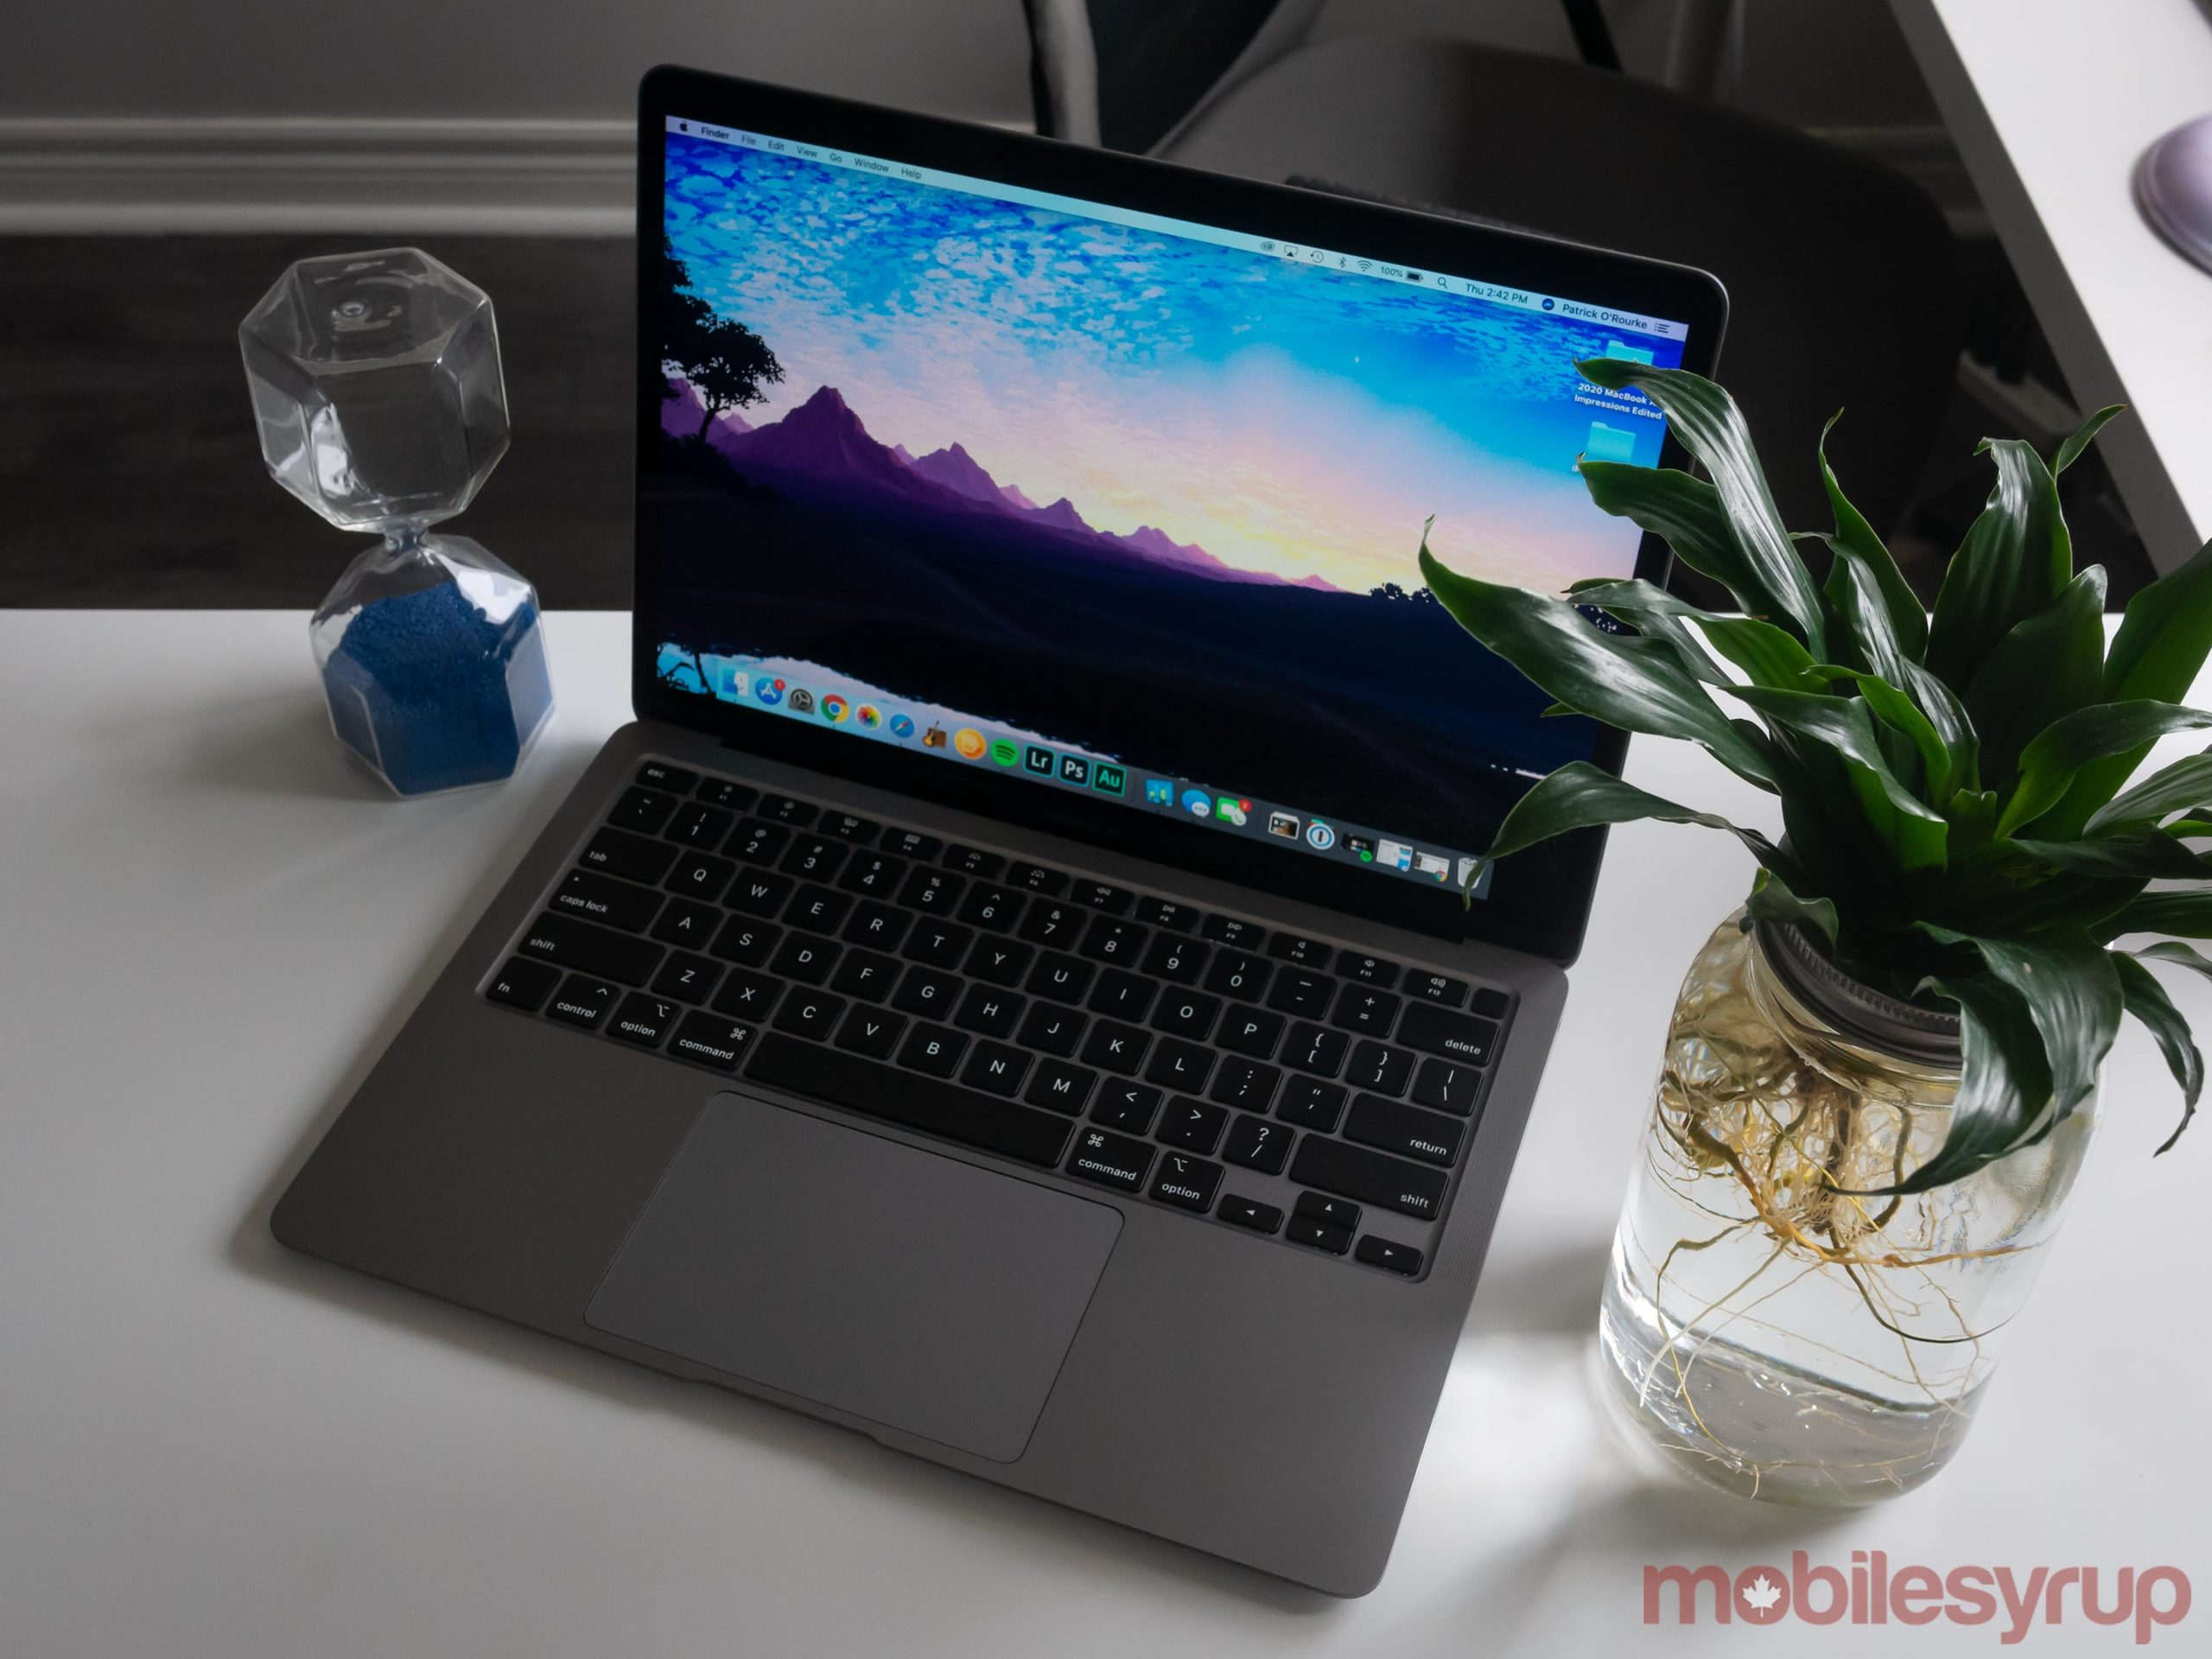 MacBook Air (2020) on an angle